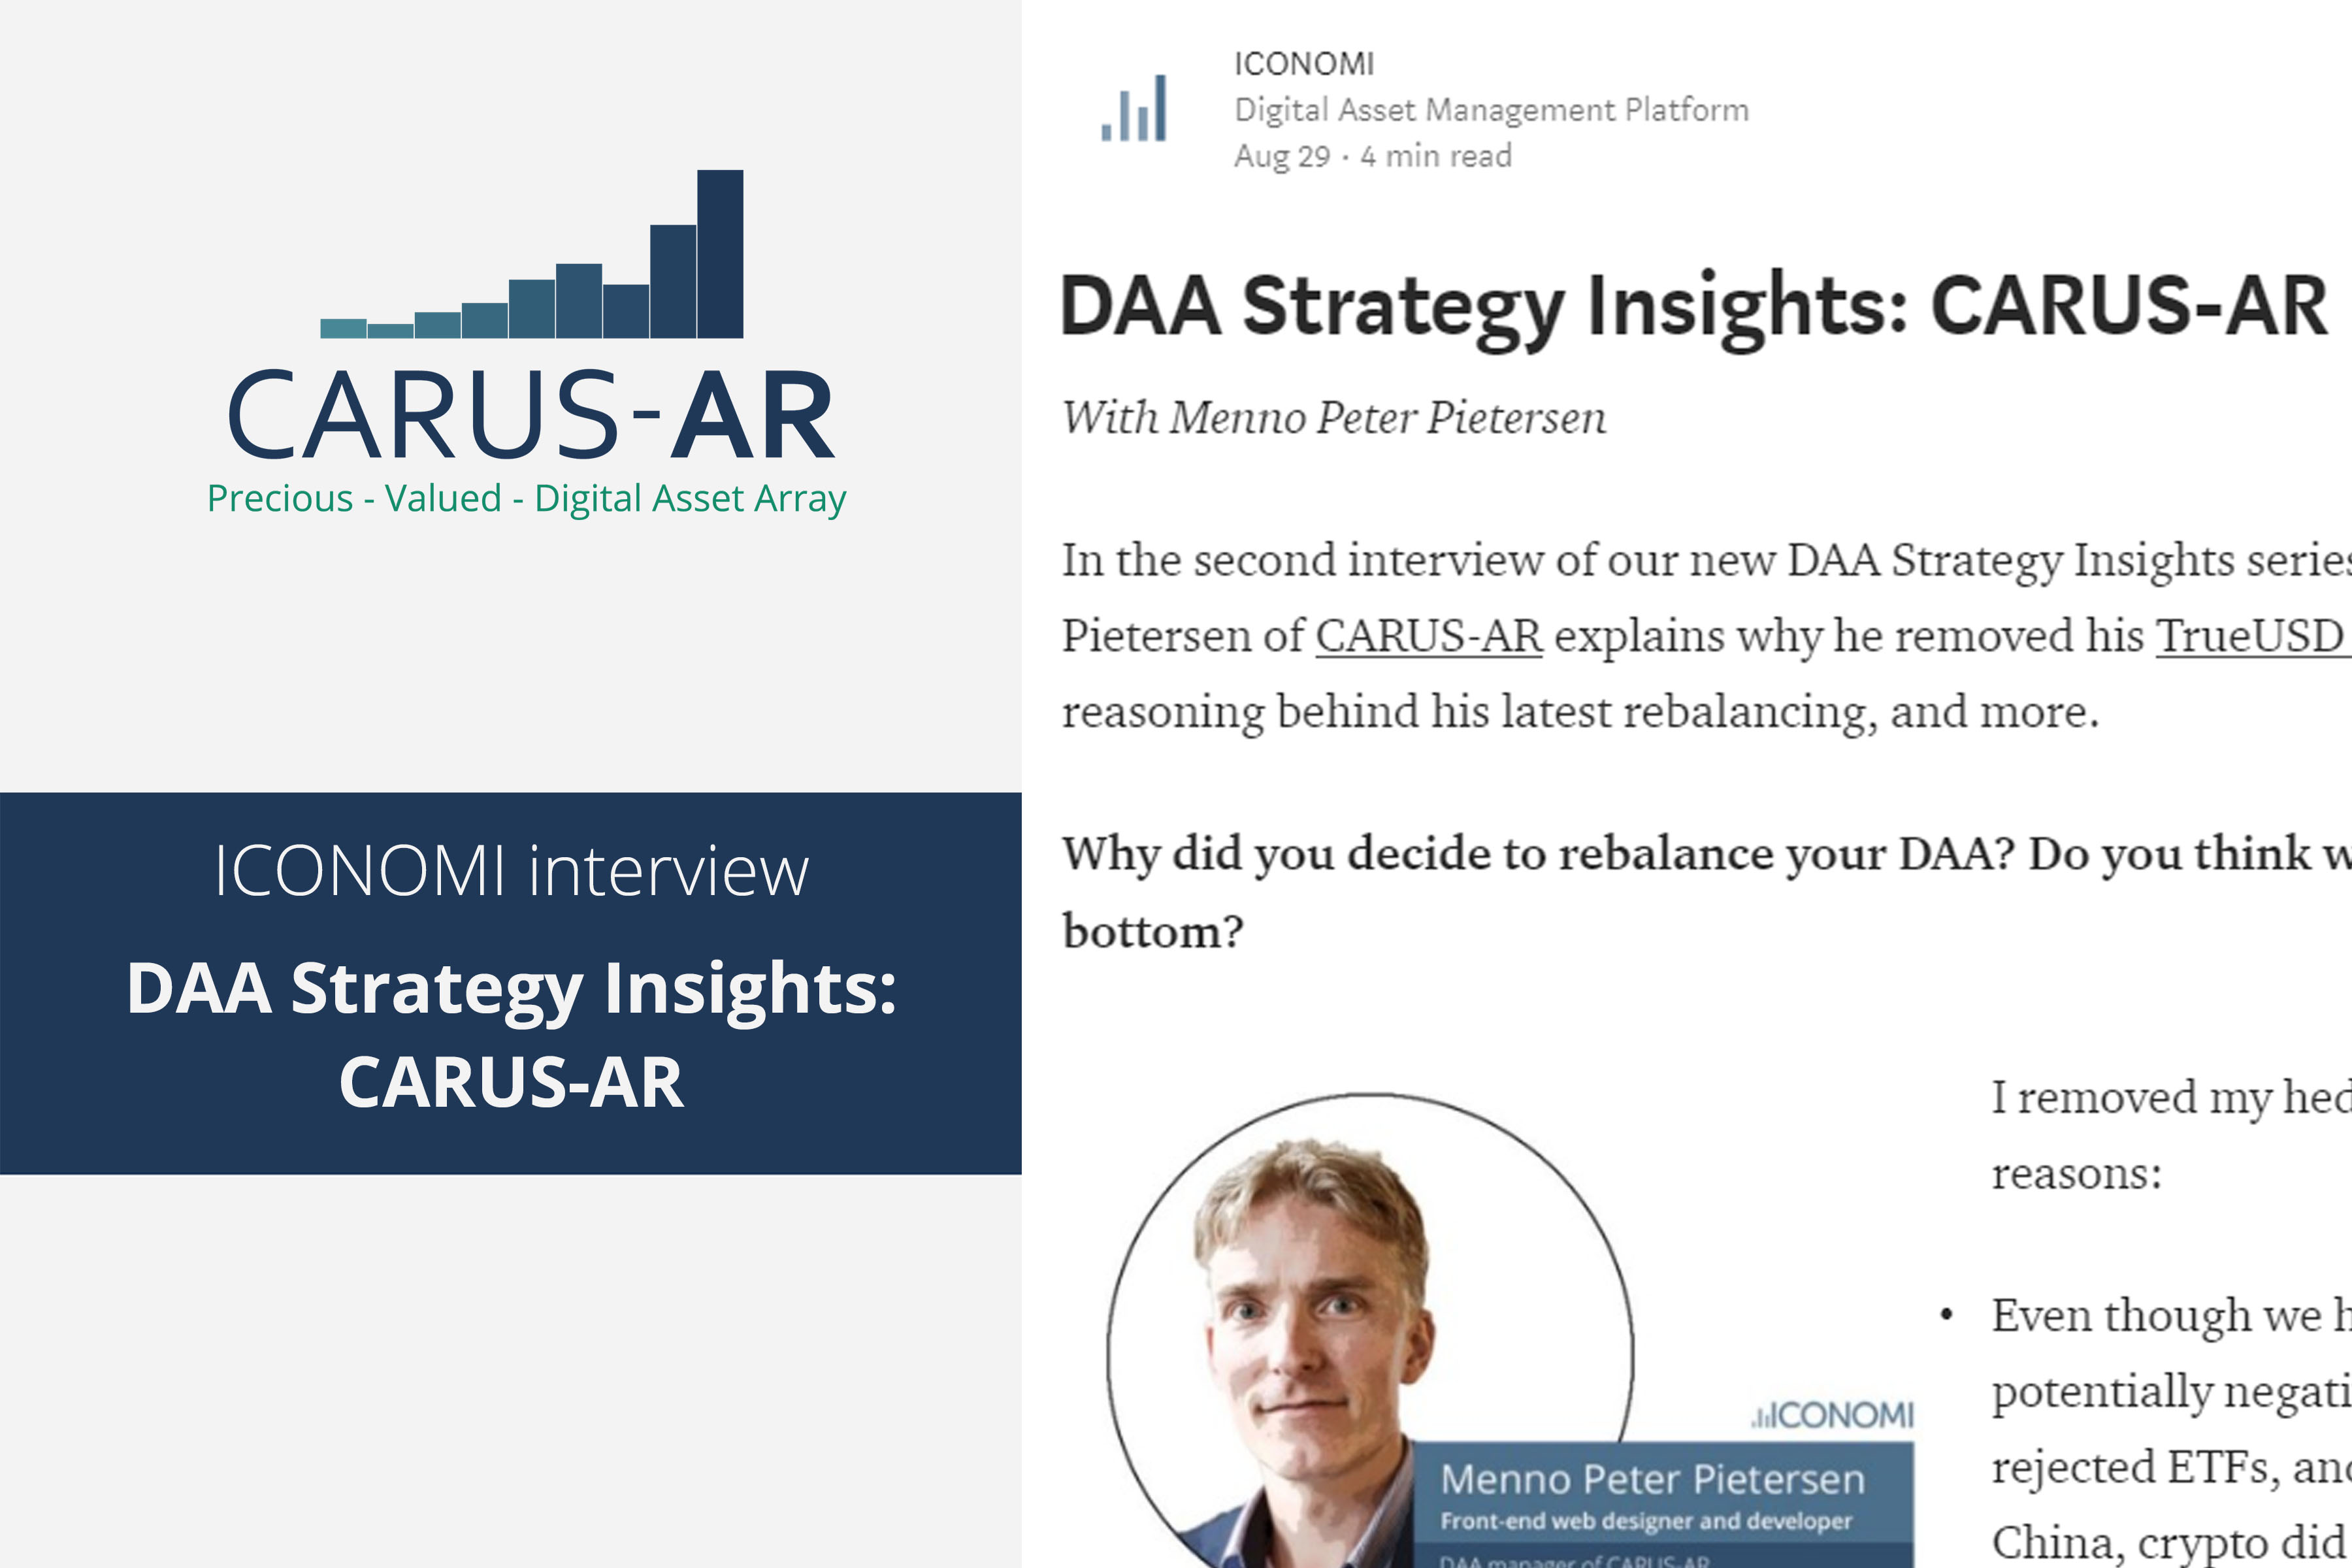 DAA Strategy Insights: CARUS-AR